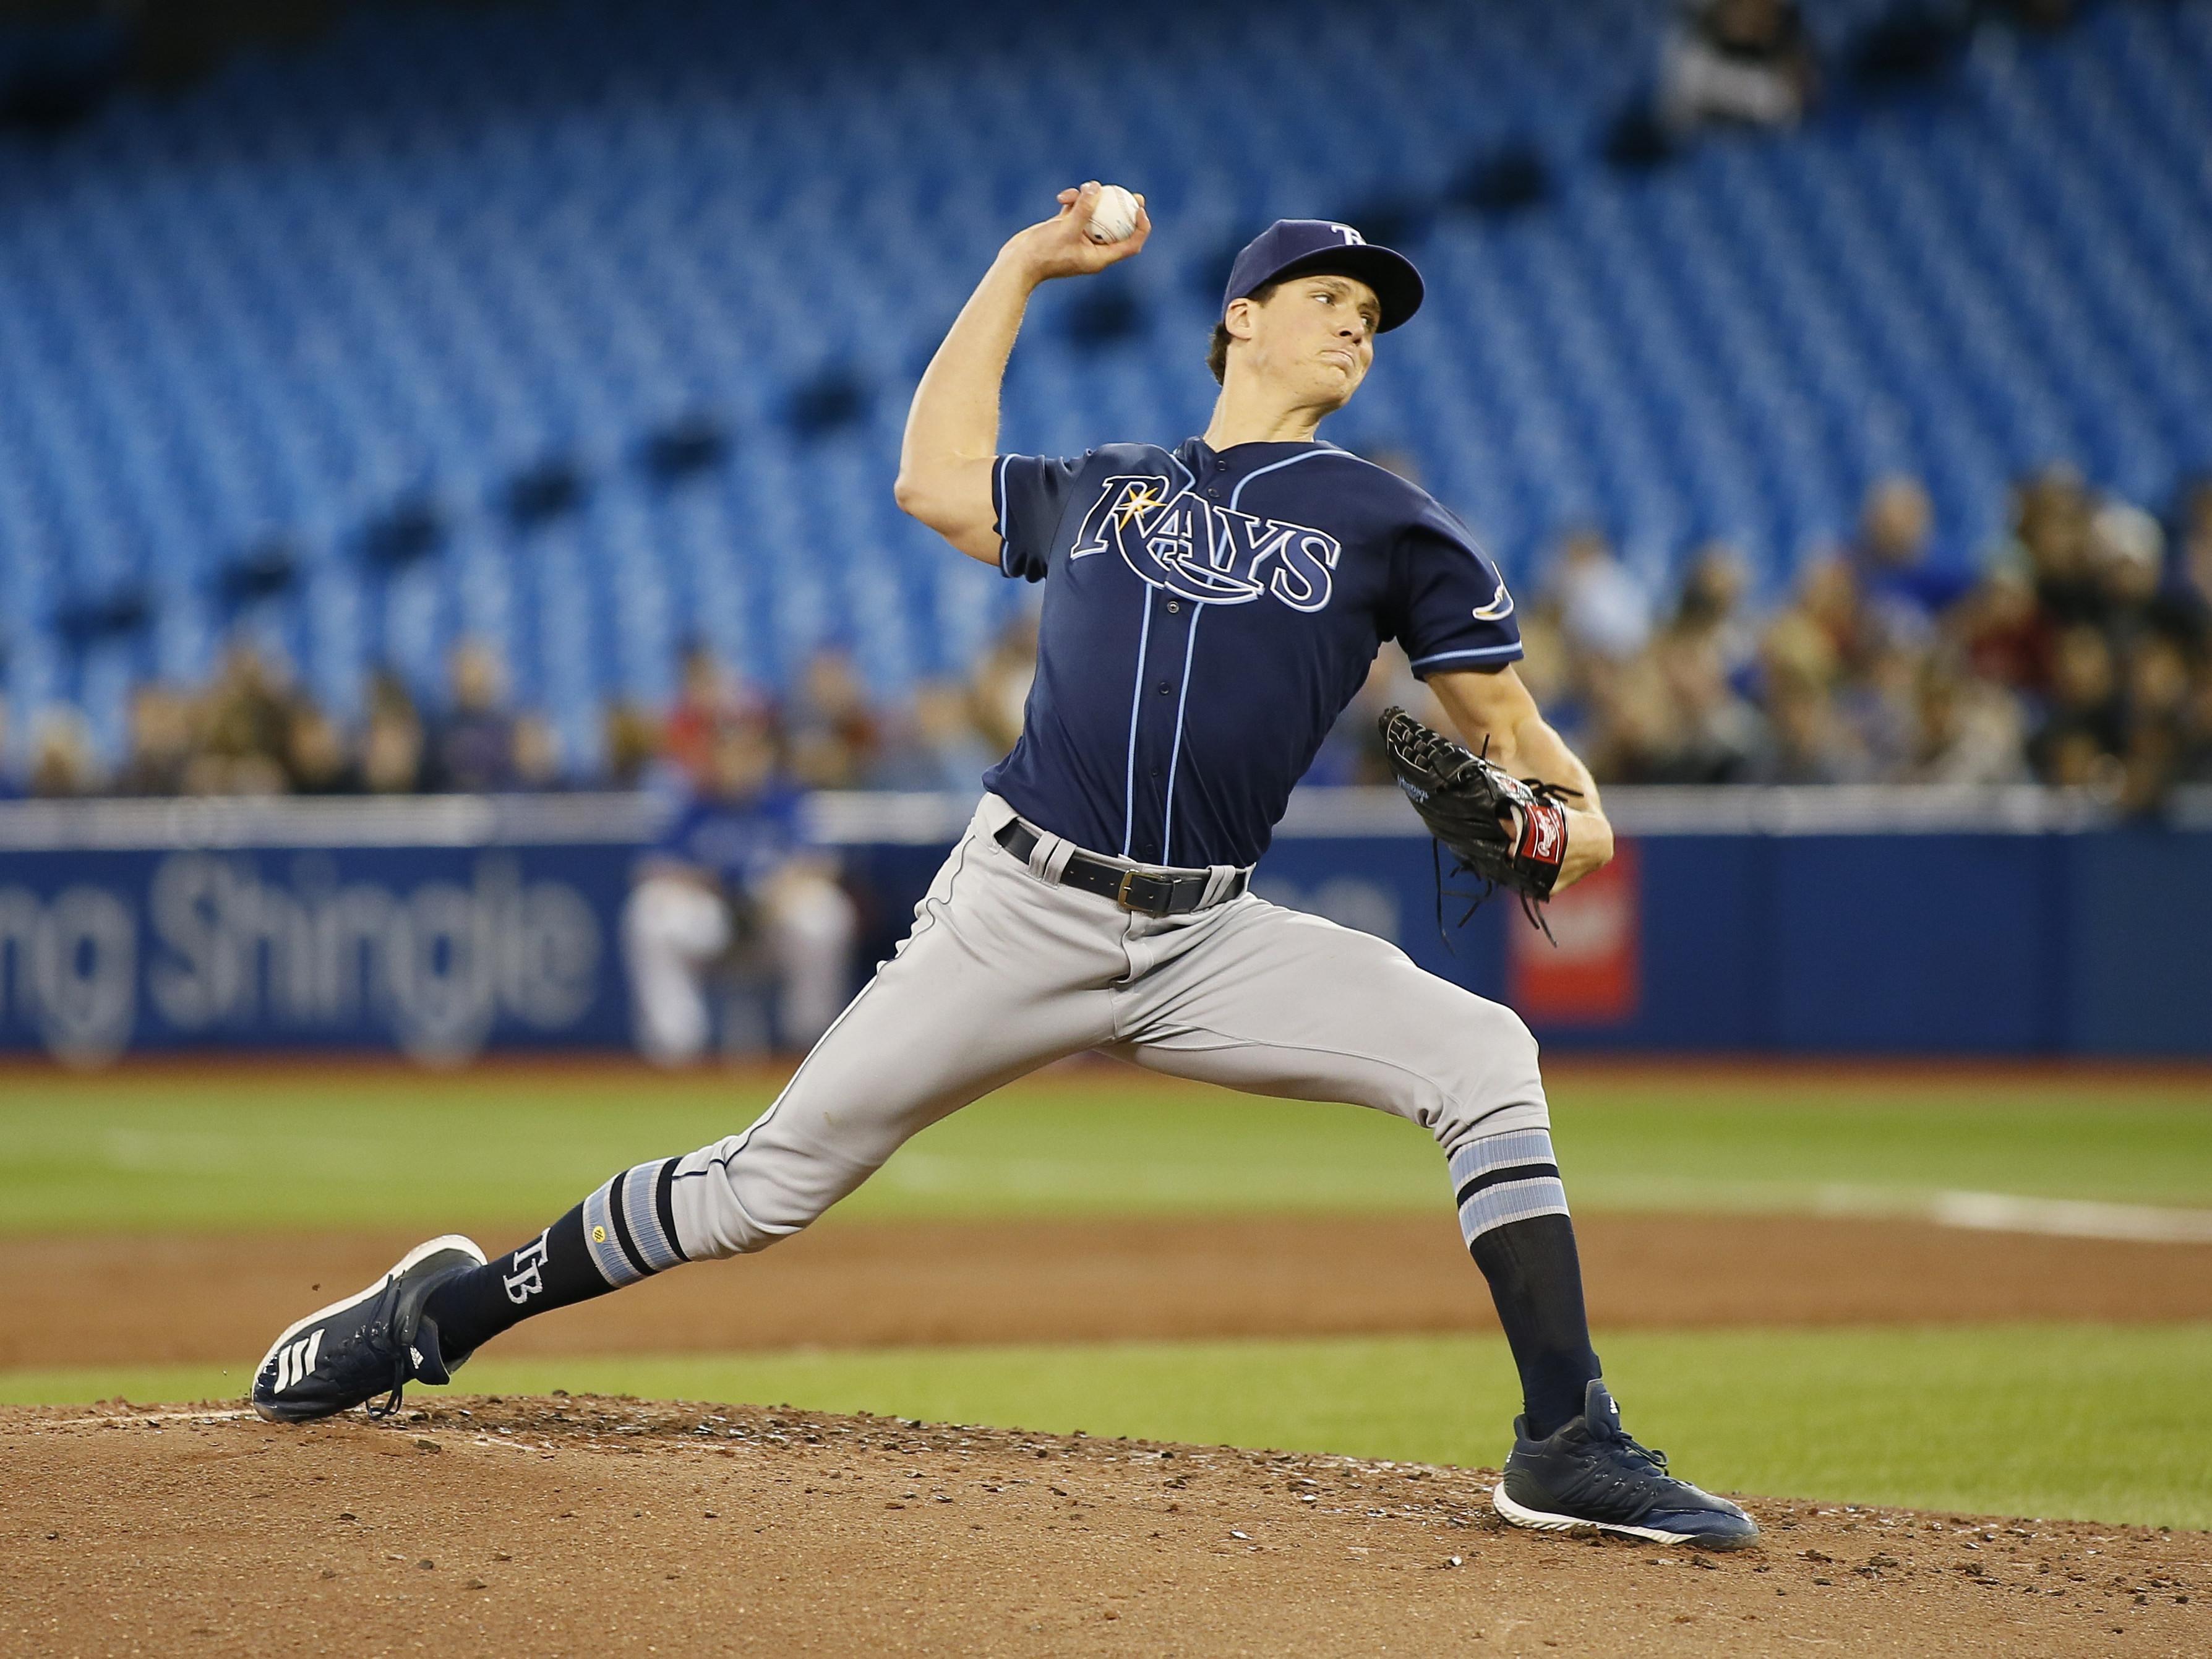 MLB: Tampa Bay Rays at Toronto Blue Jays